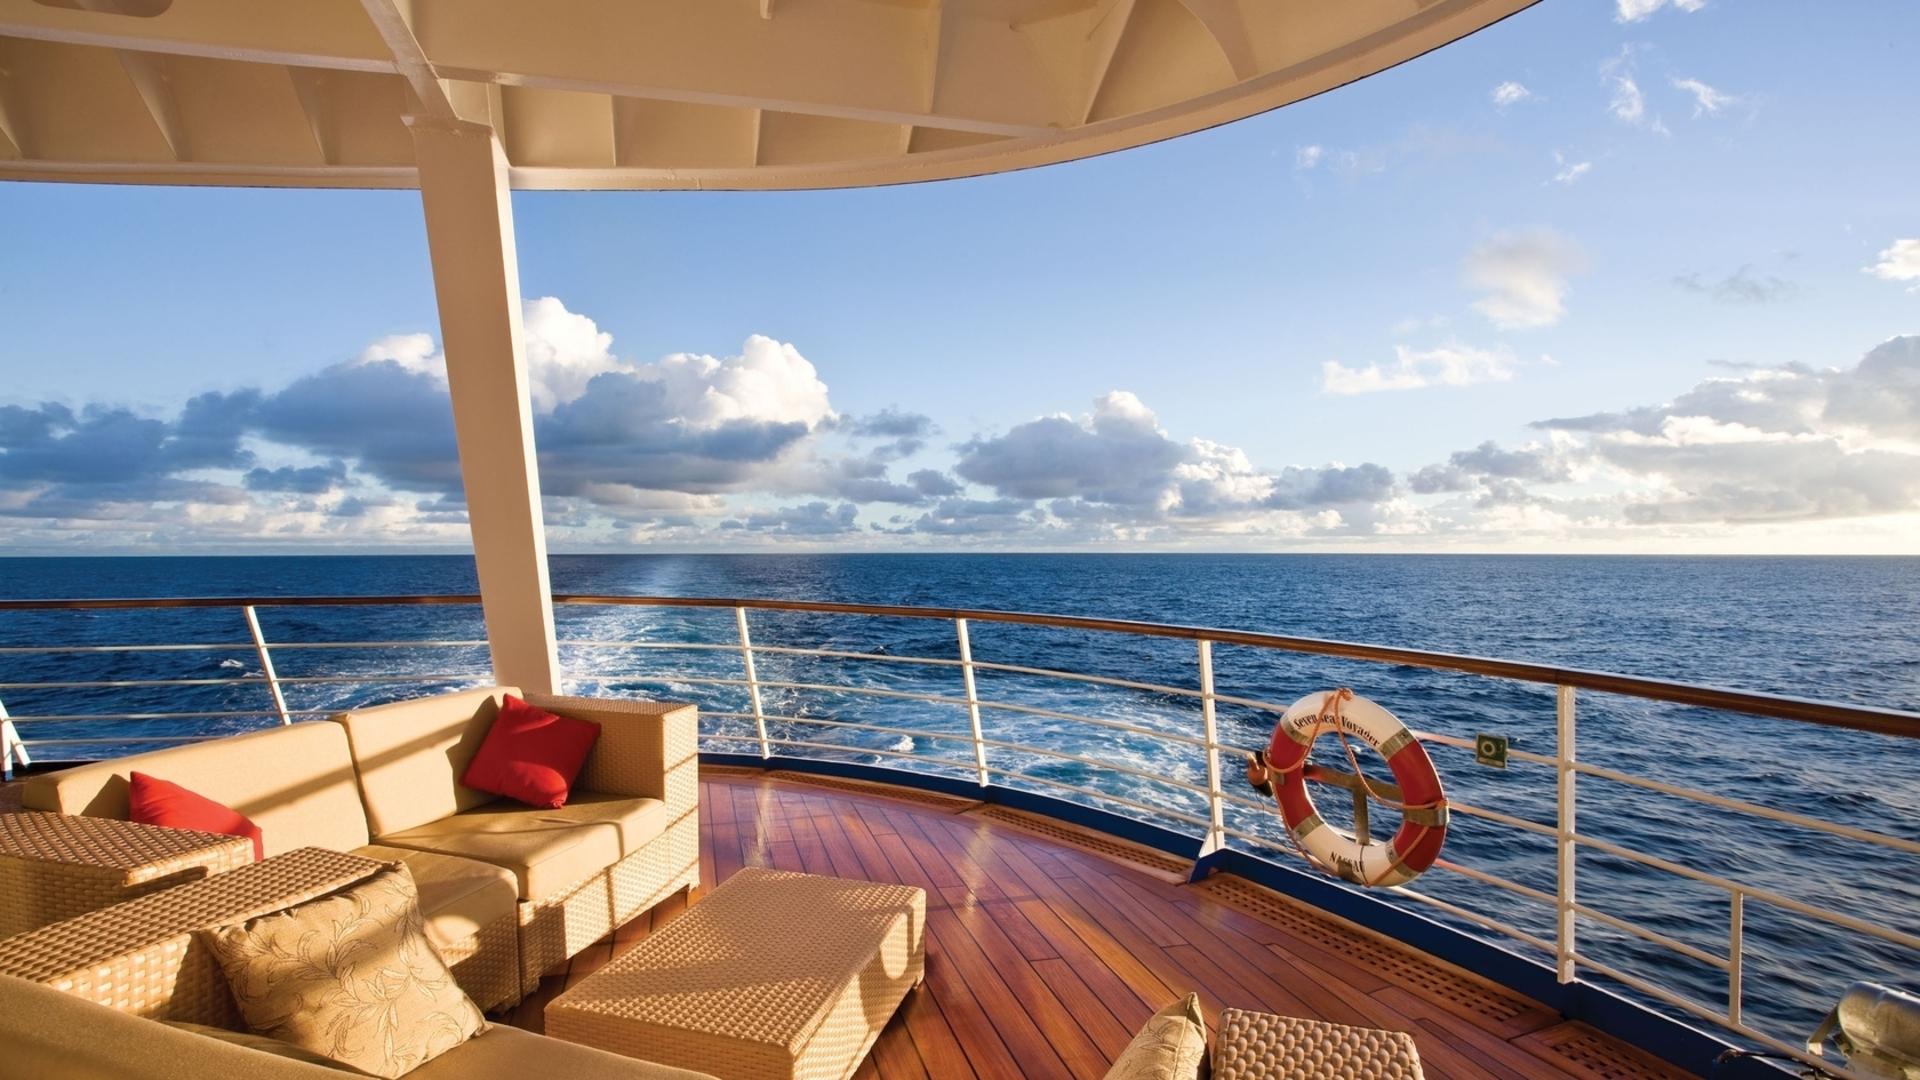 Wallpaper Boat Sea Vehicle Cruise Ship Caribbean Vacation Scenery View Watercraft Passenger Ship Luxury Yacht 1920x1080 638820 Hd Wallpapers Wallhere